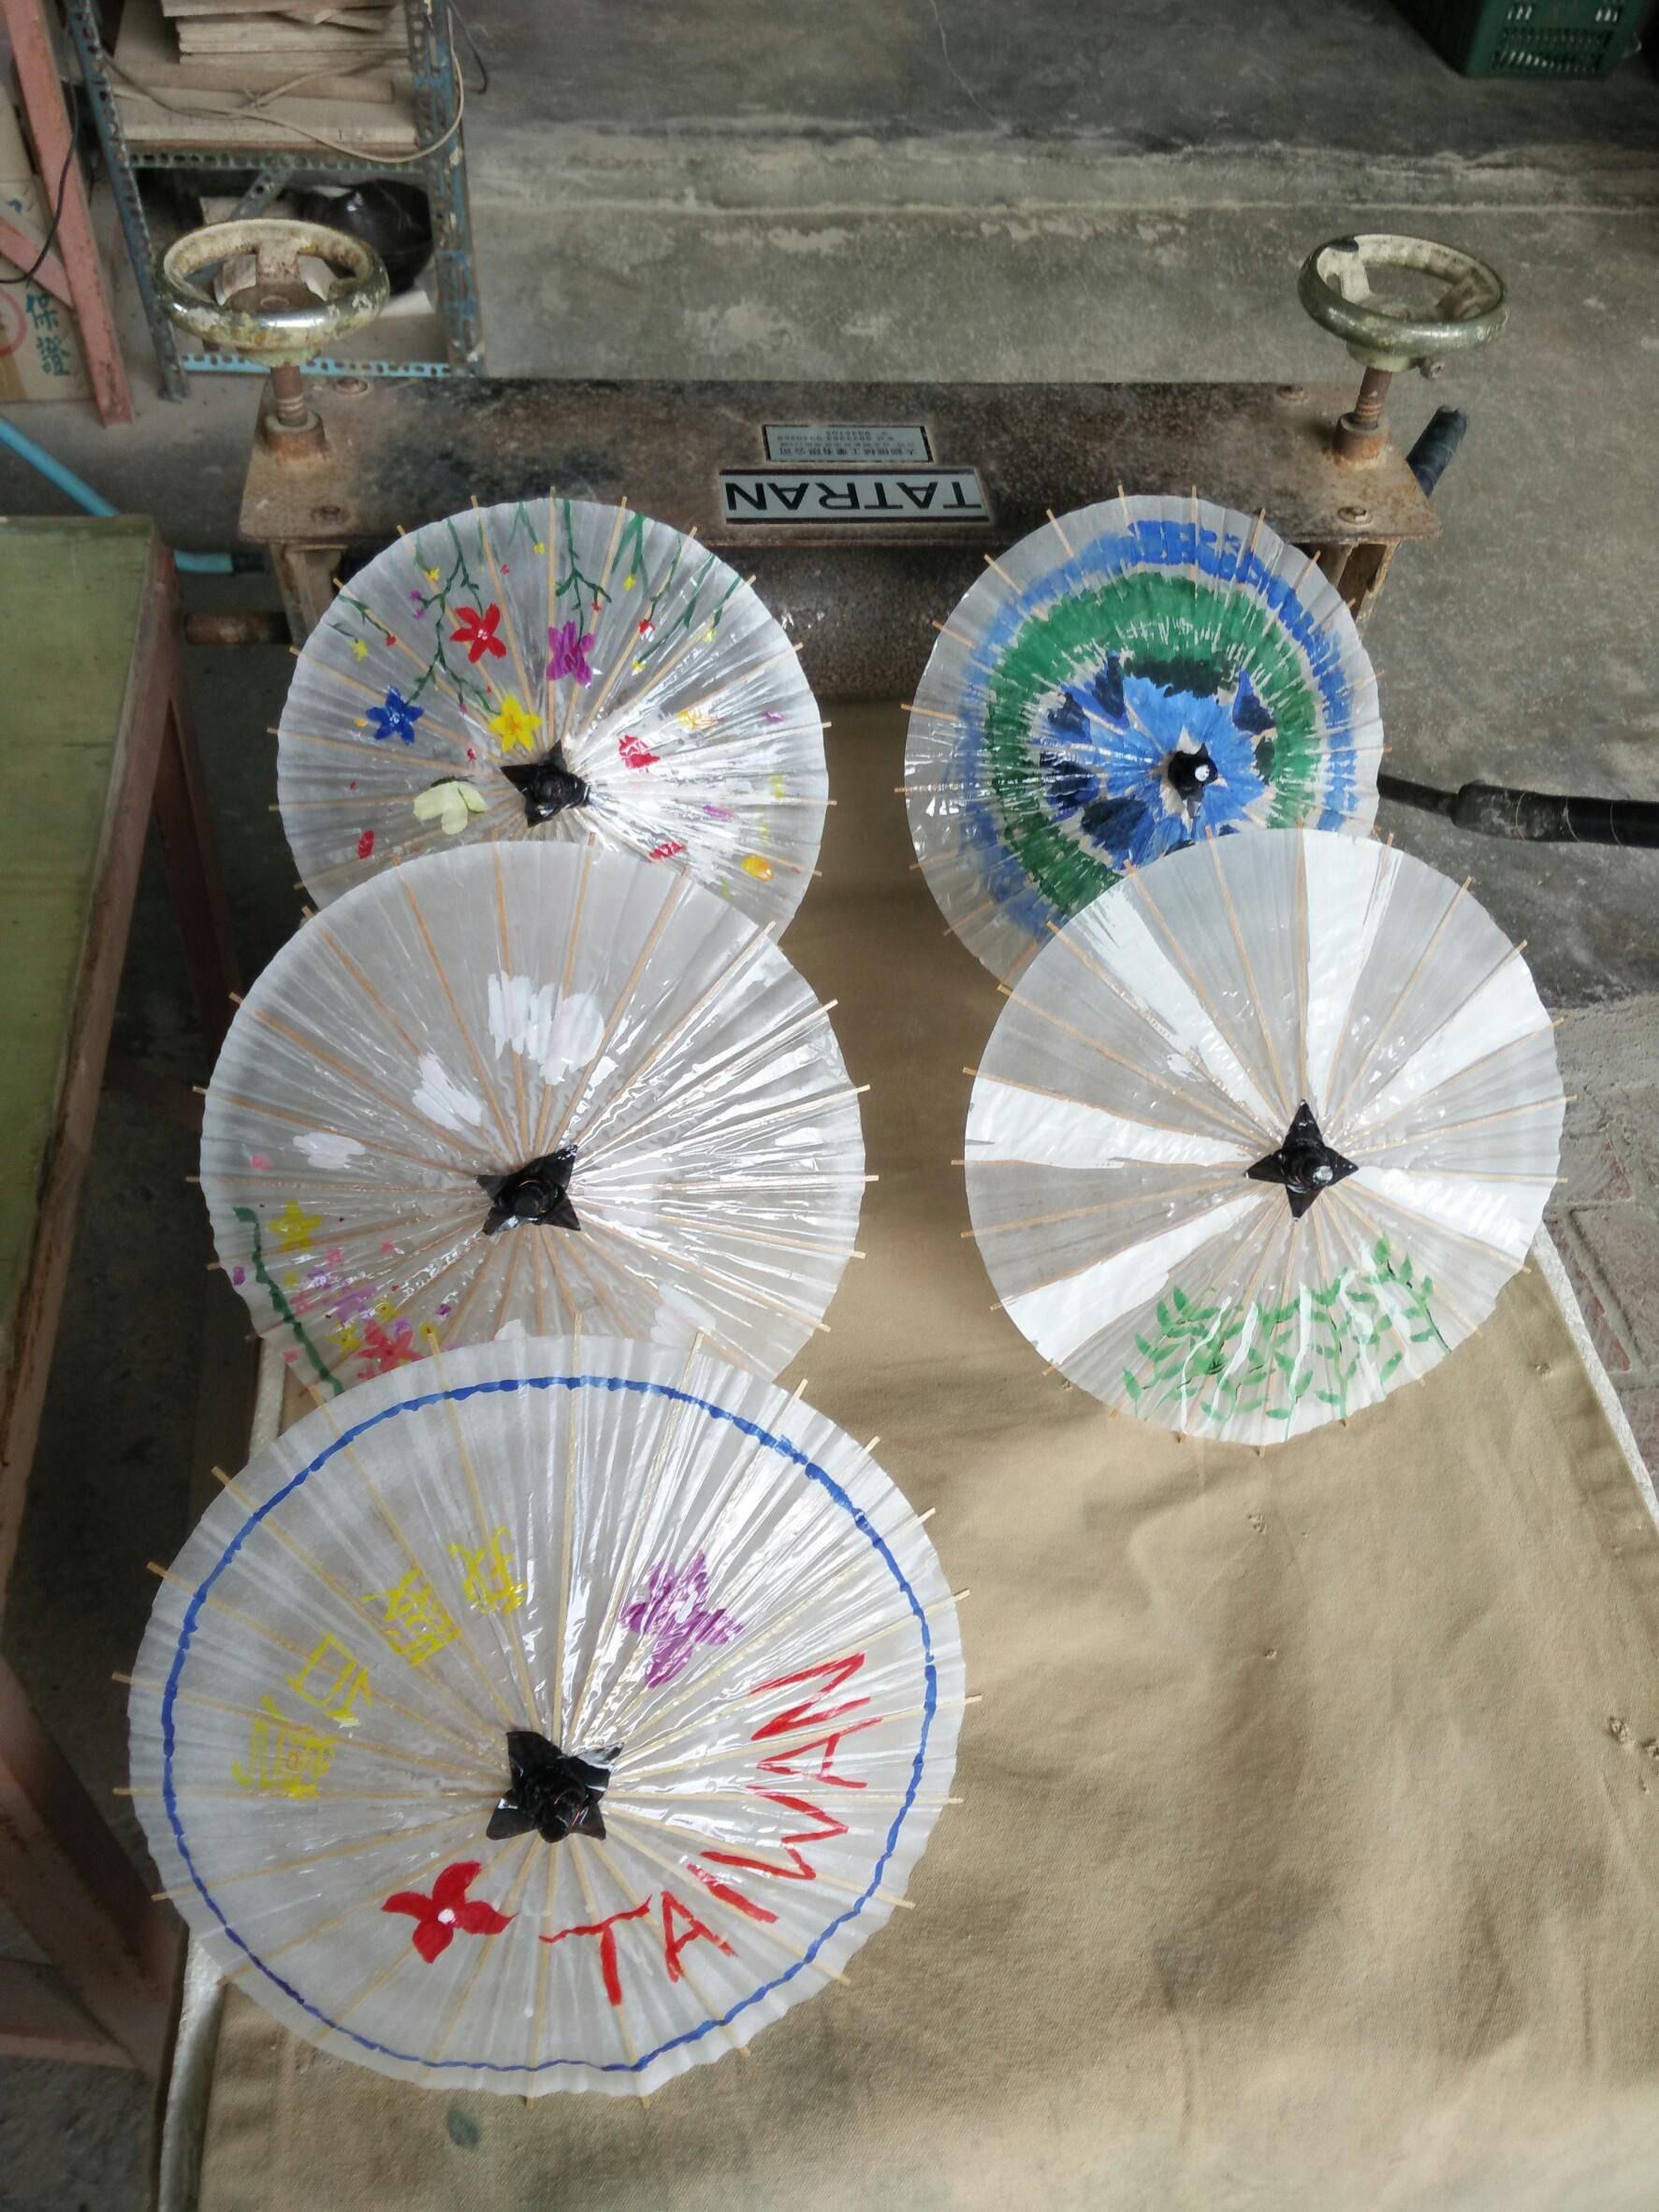 2018-07-24 美濃紙傘Meinong's Paper Umbrella